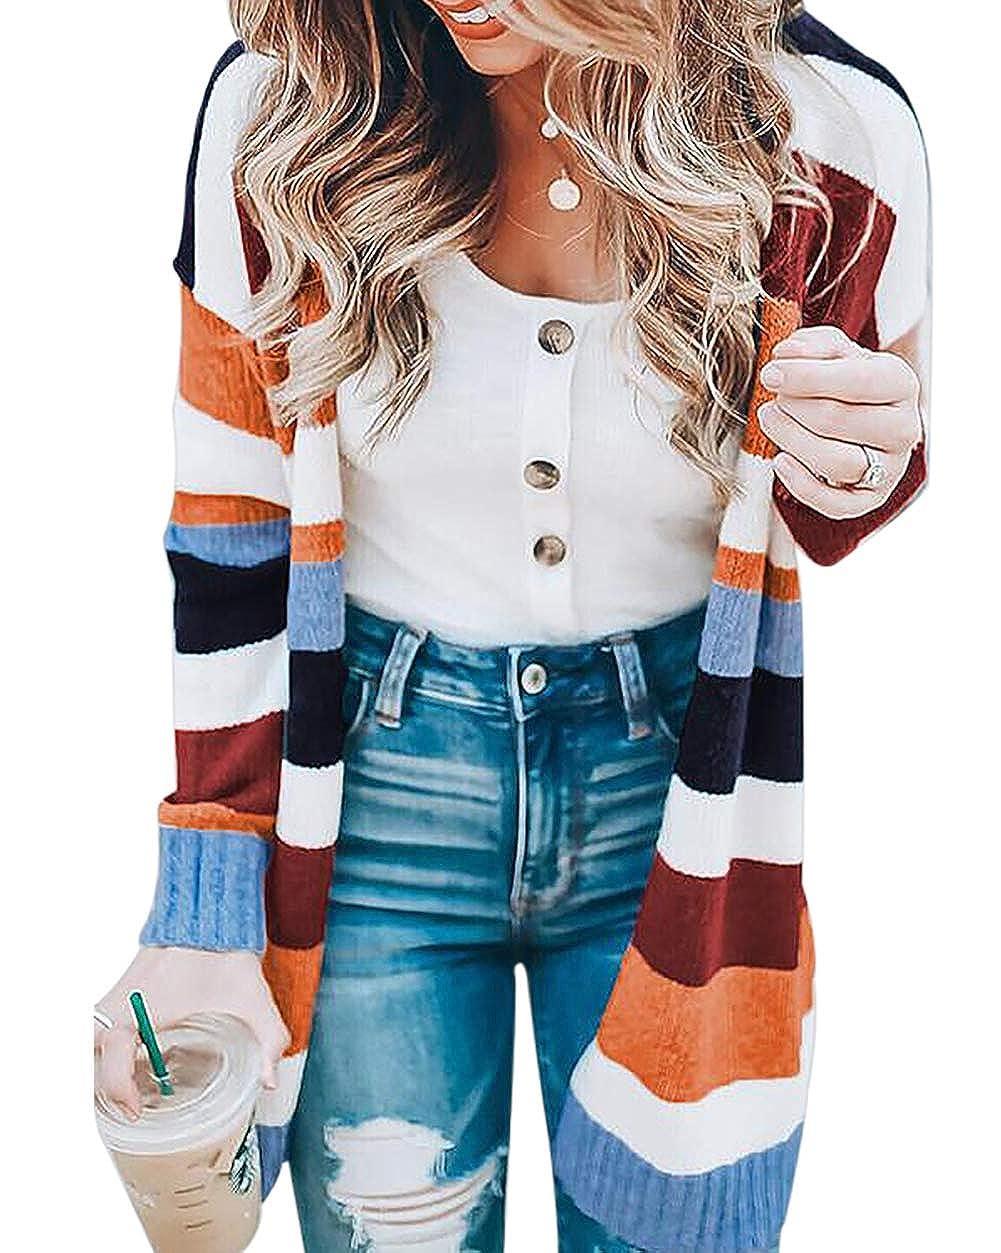 Fall Womens Casual Cardigan Loose Camo Long Sleeve Blouse Shirt Outwear Jacket Coat Tops Casual Blouses & Shirts